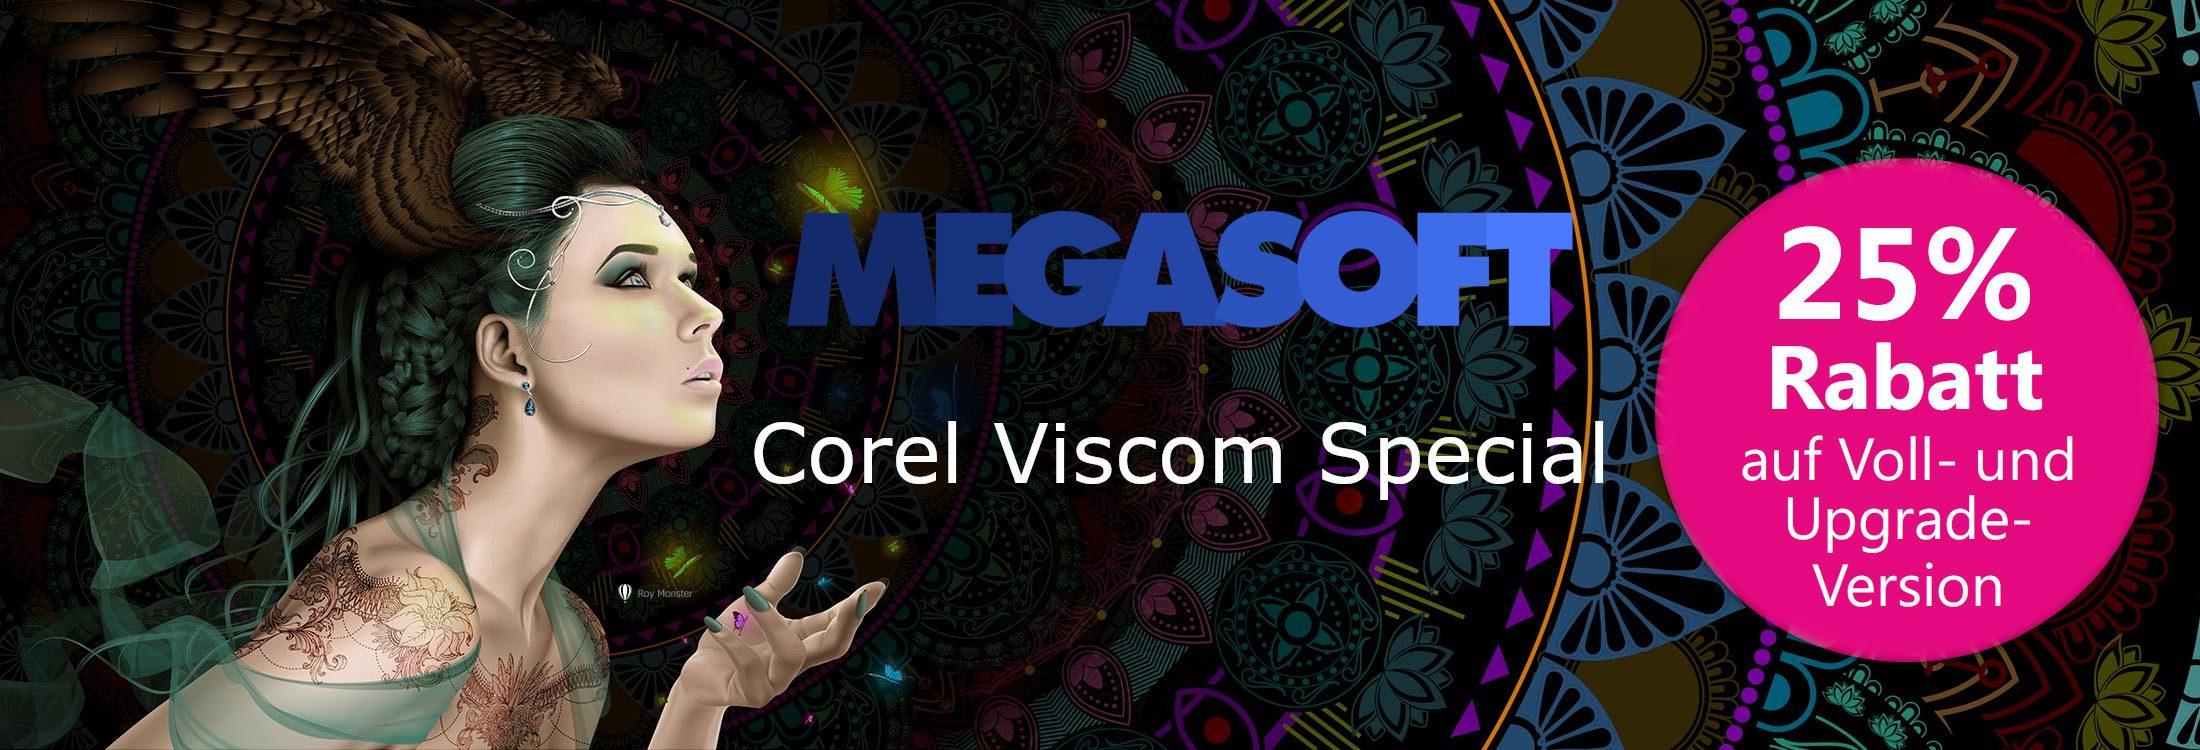 Corel Viscom Special 25% Rabatt